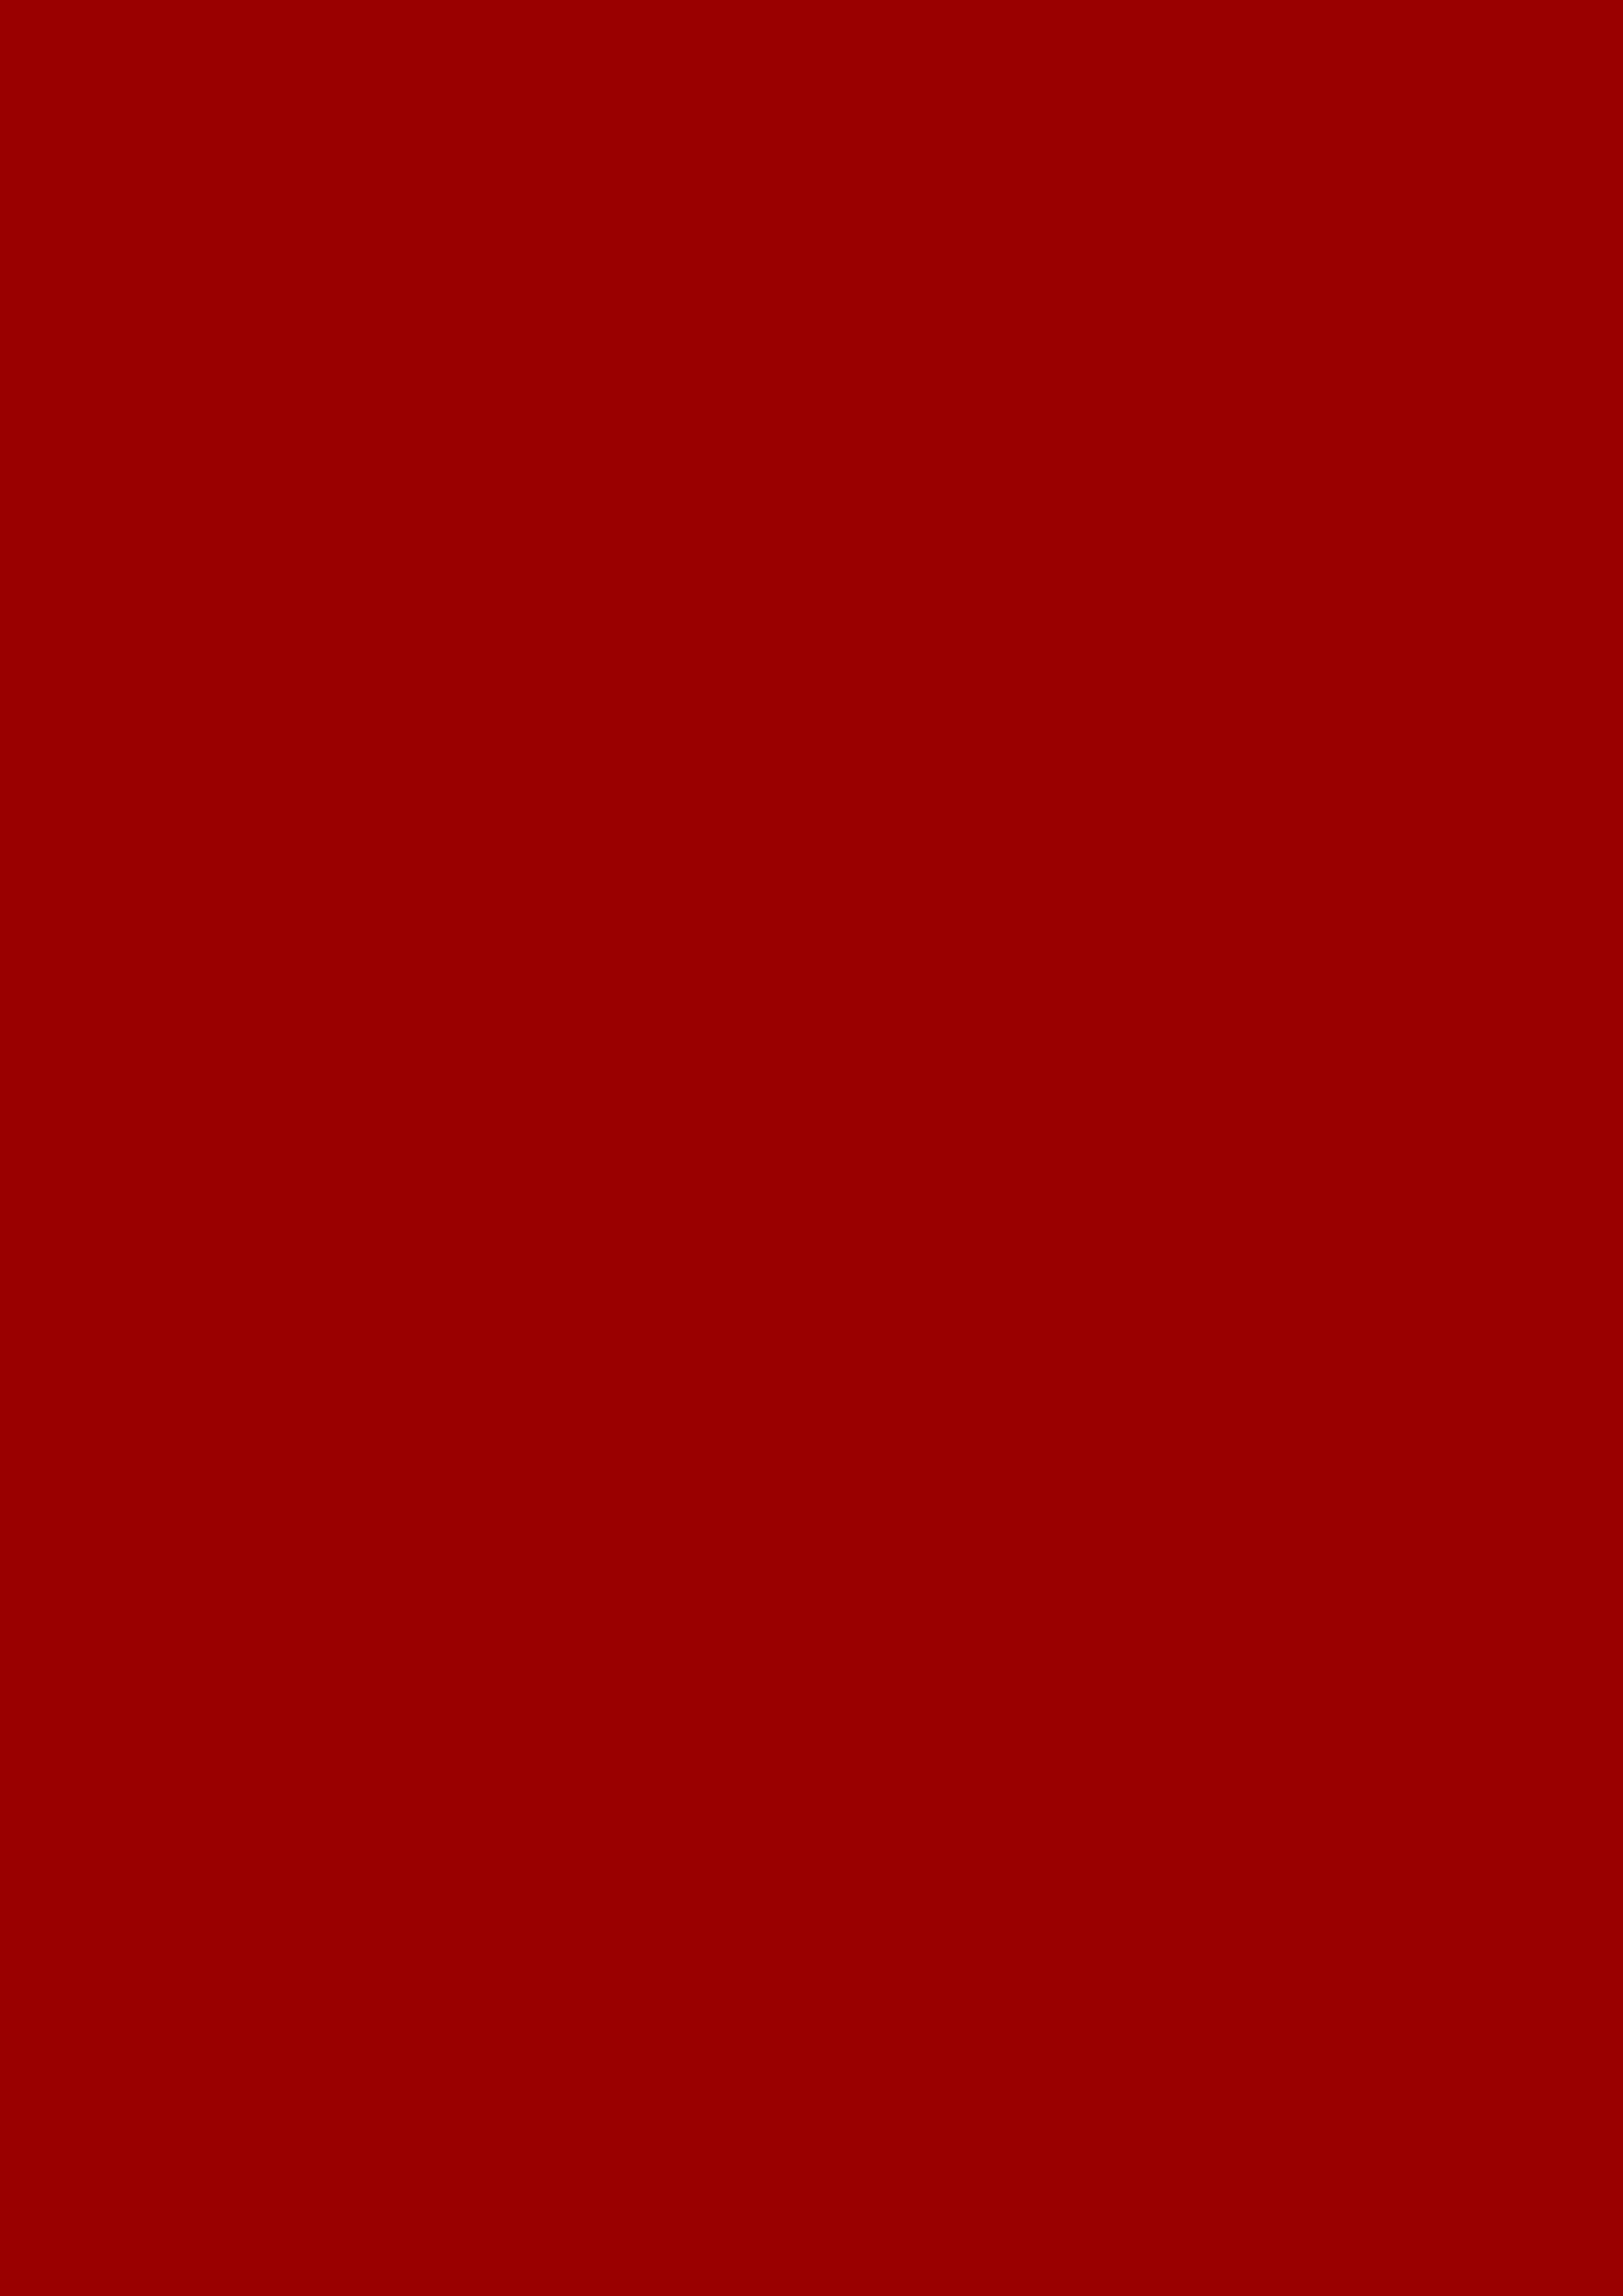 2480x3508 Stizza Solid Color Background